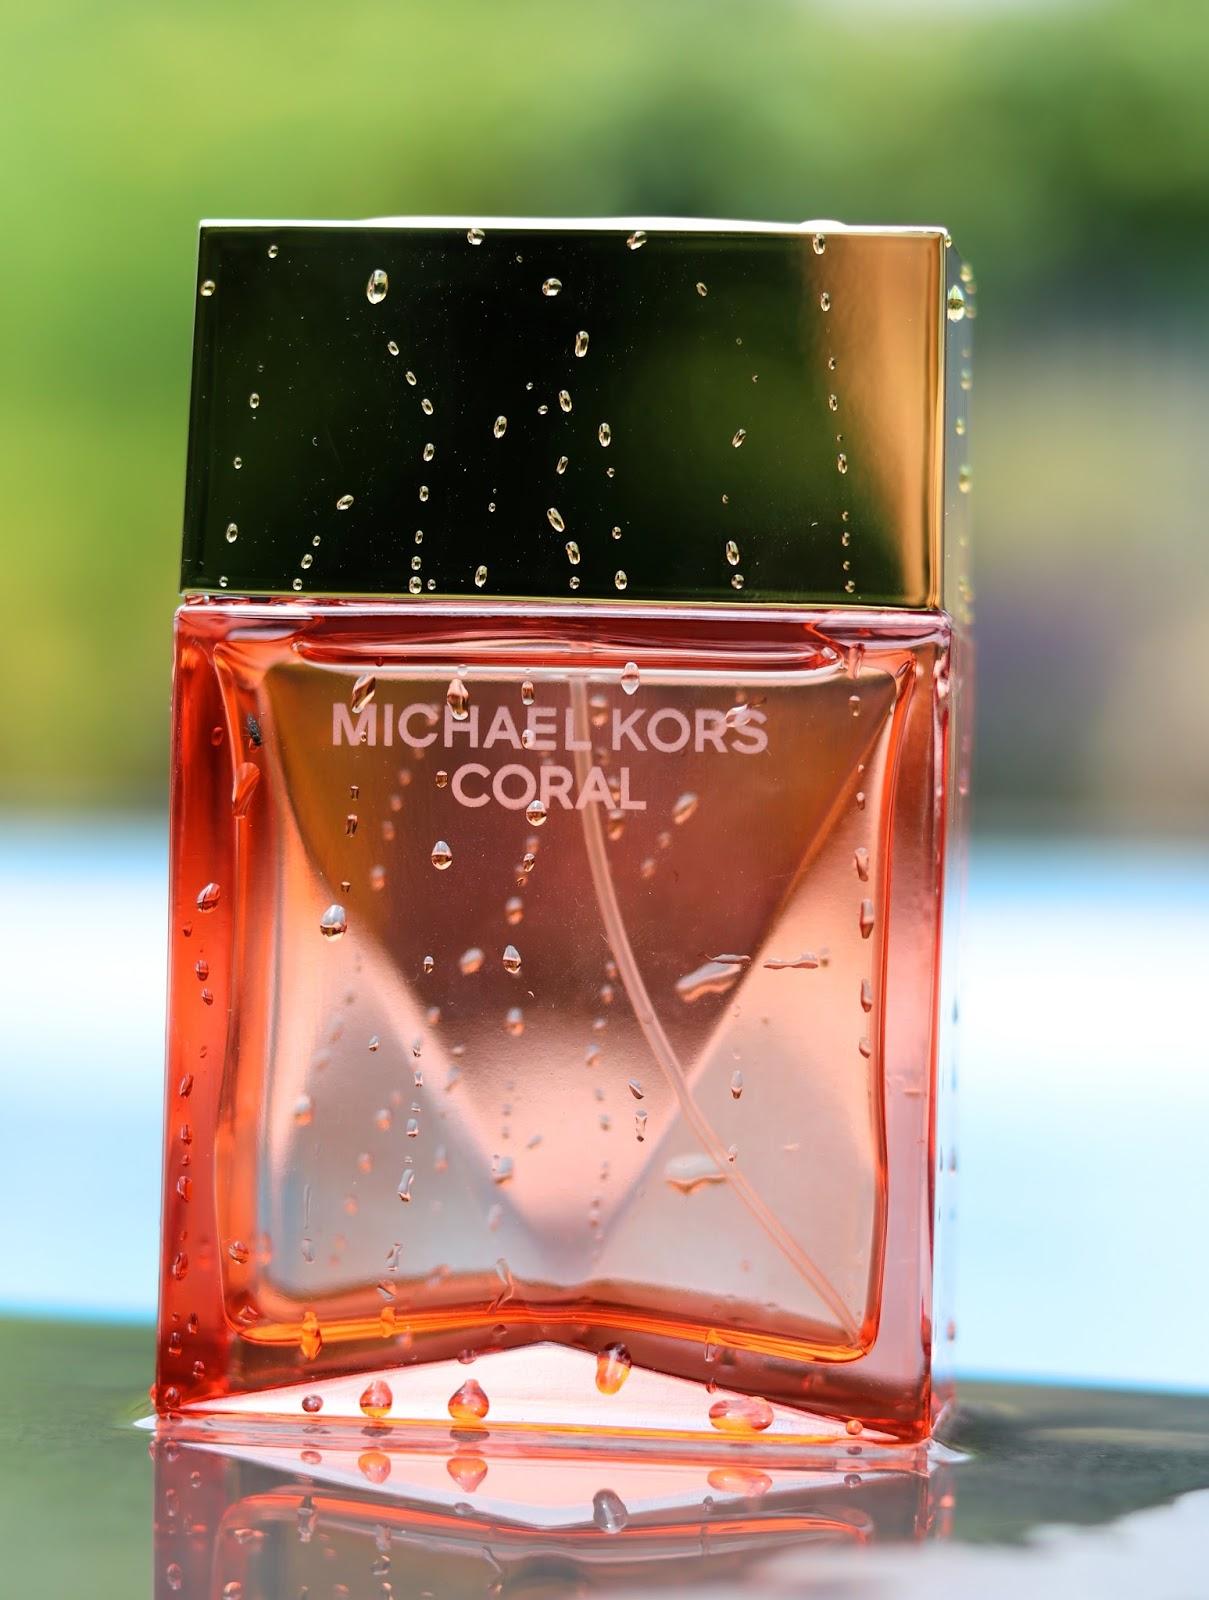 Michael Kors Coral, Fragrances